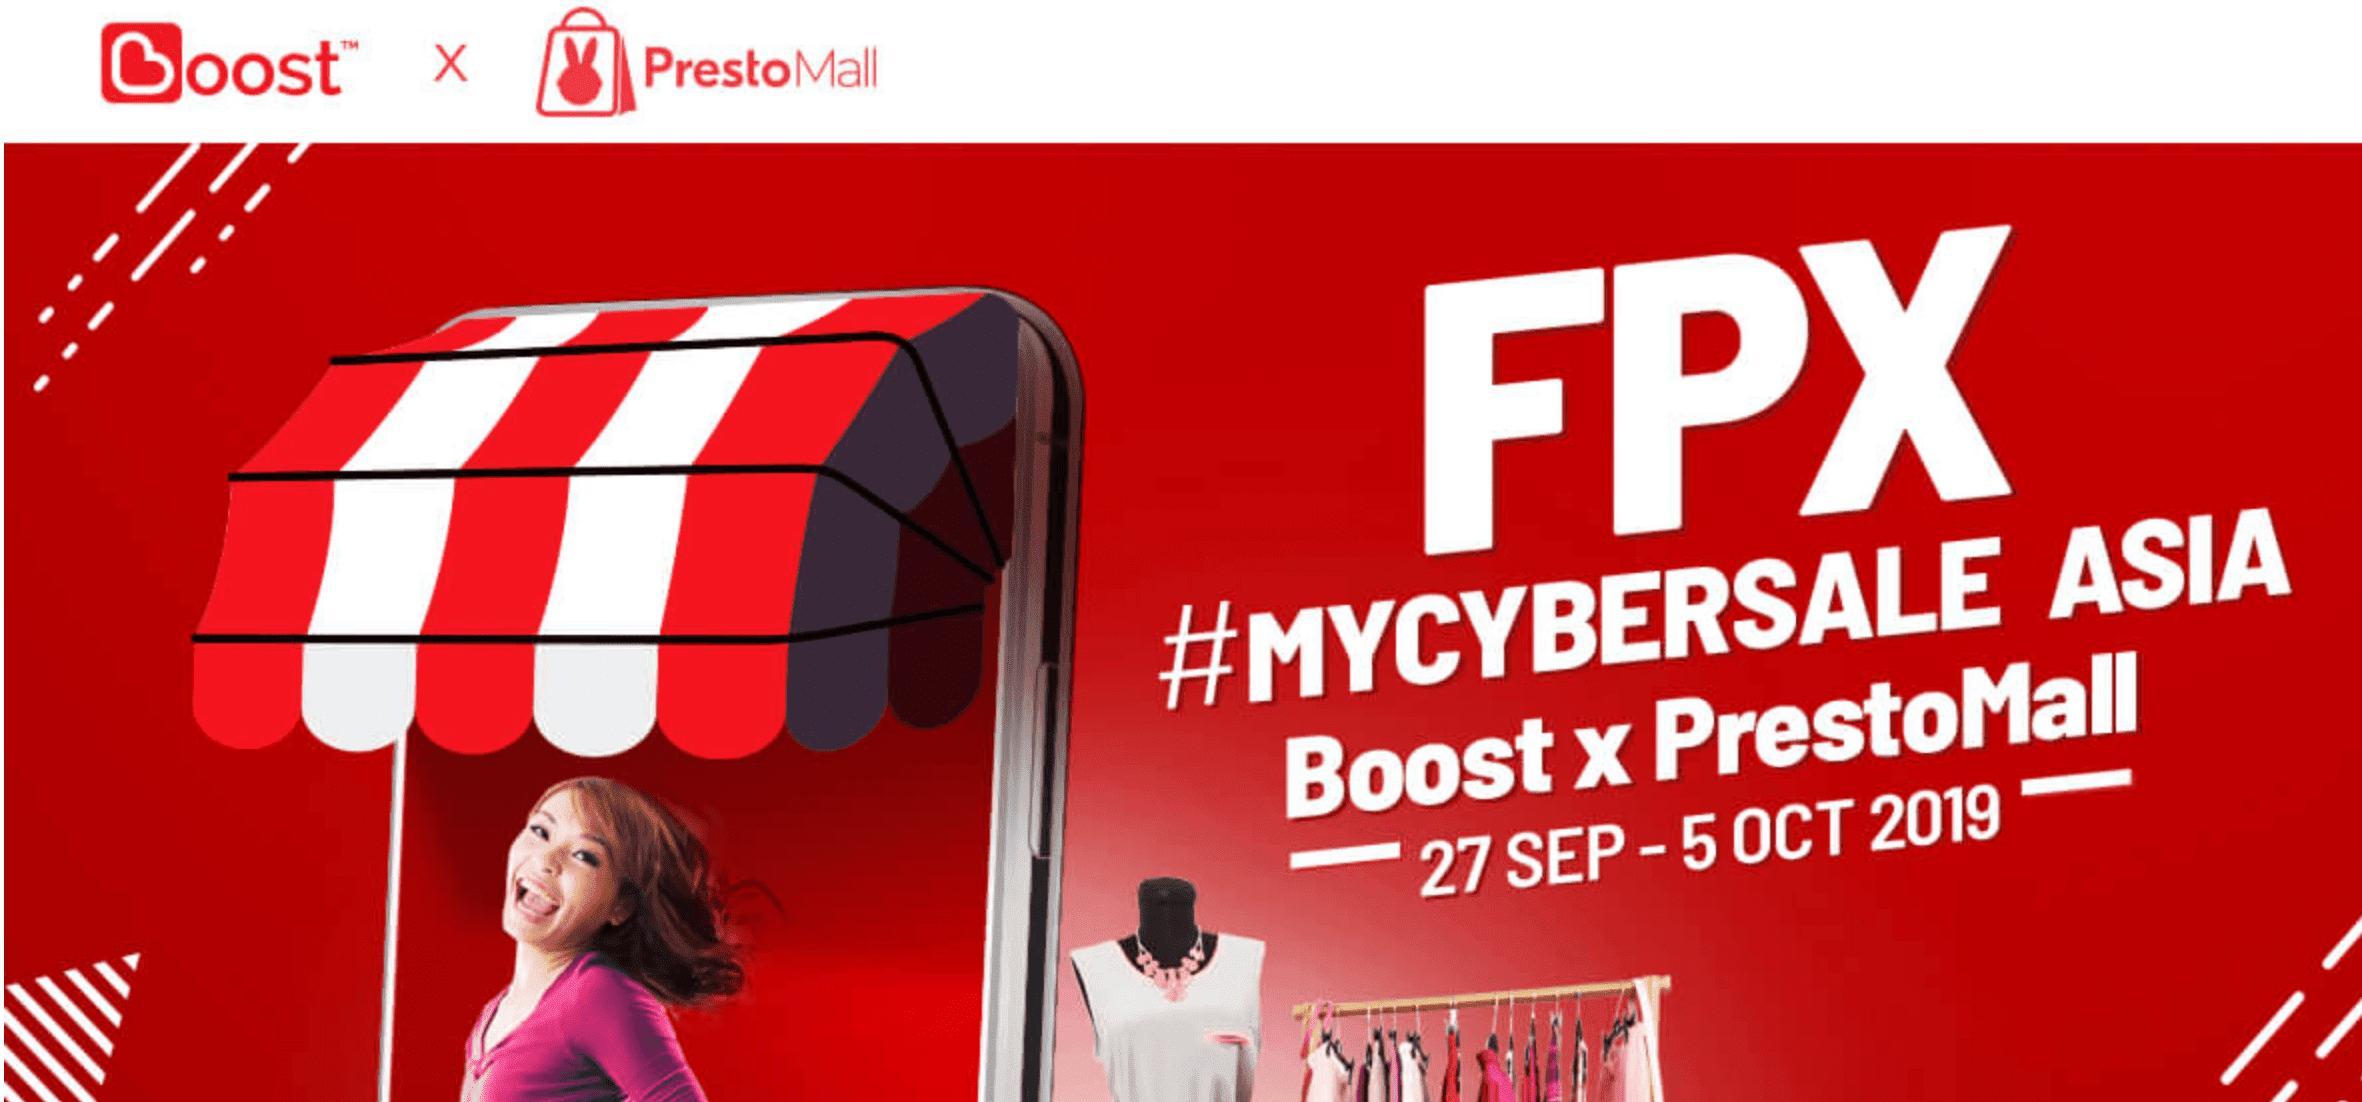 PrestoMall MyCyberSale 2019